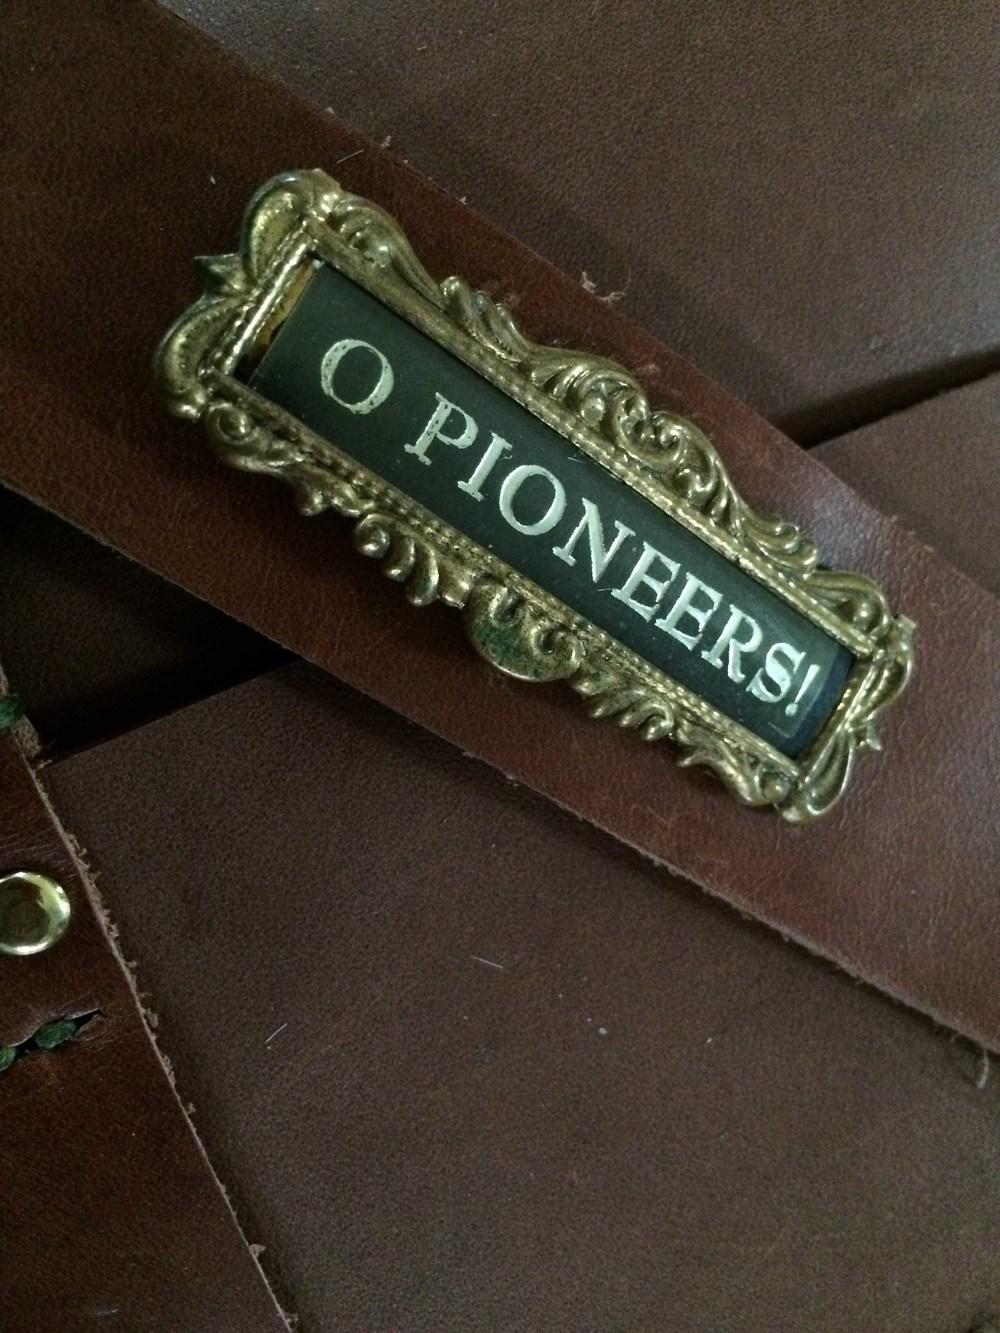 dski-design-o-pioneers-journal-6.jpg